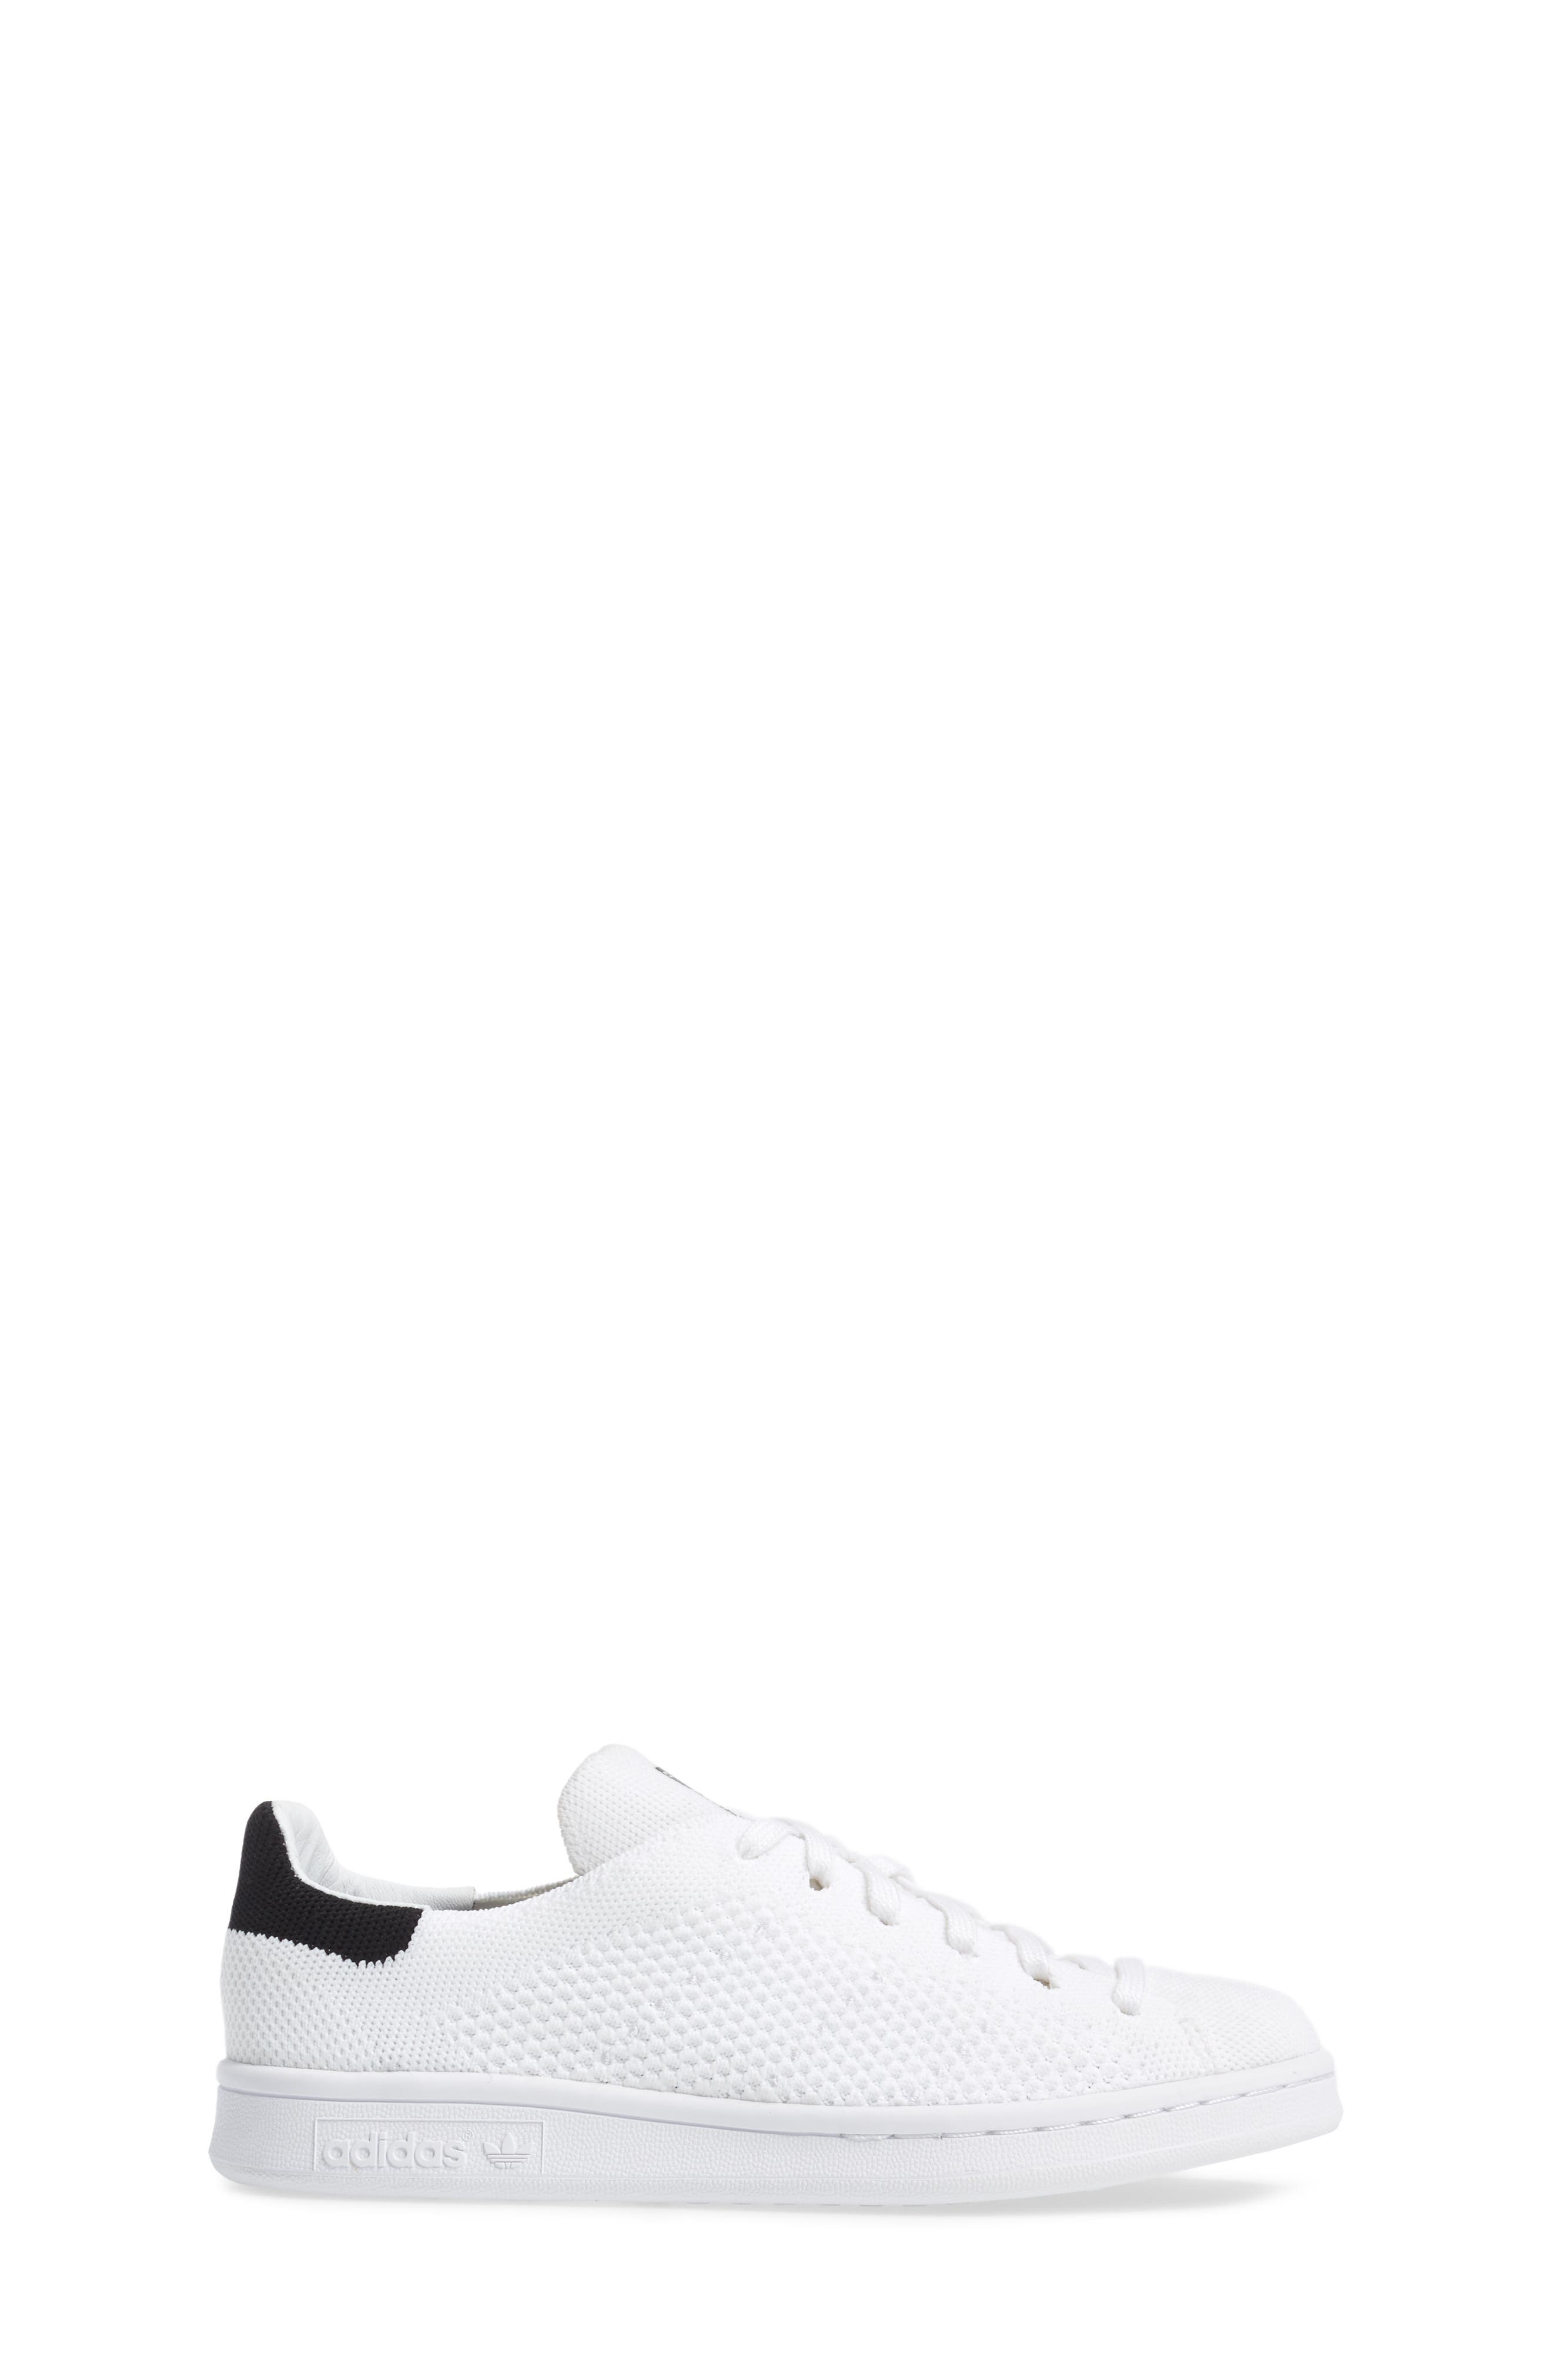 Alternate Image 3  - adidas Stan Smith Primeknit Sneaker (Big Kid)